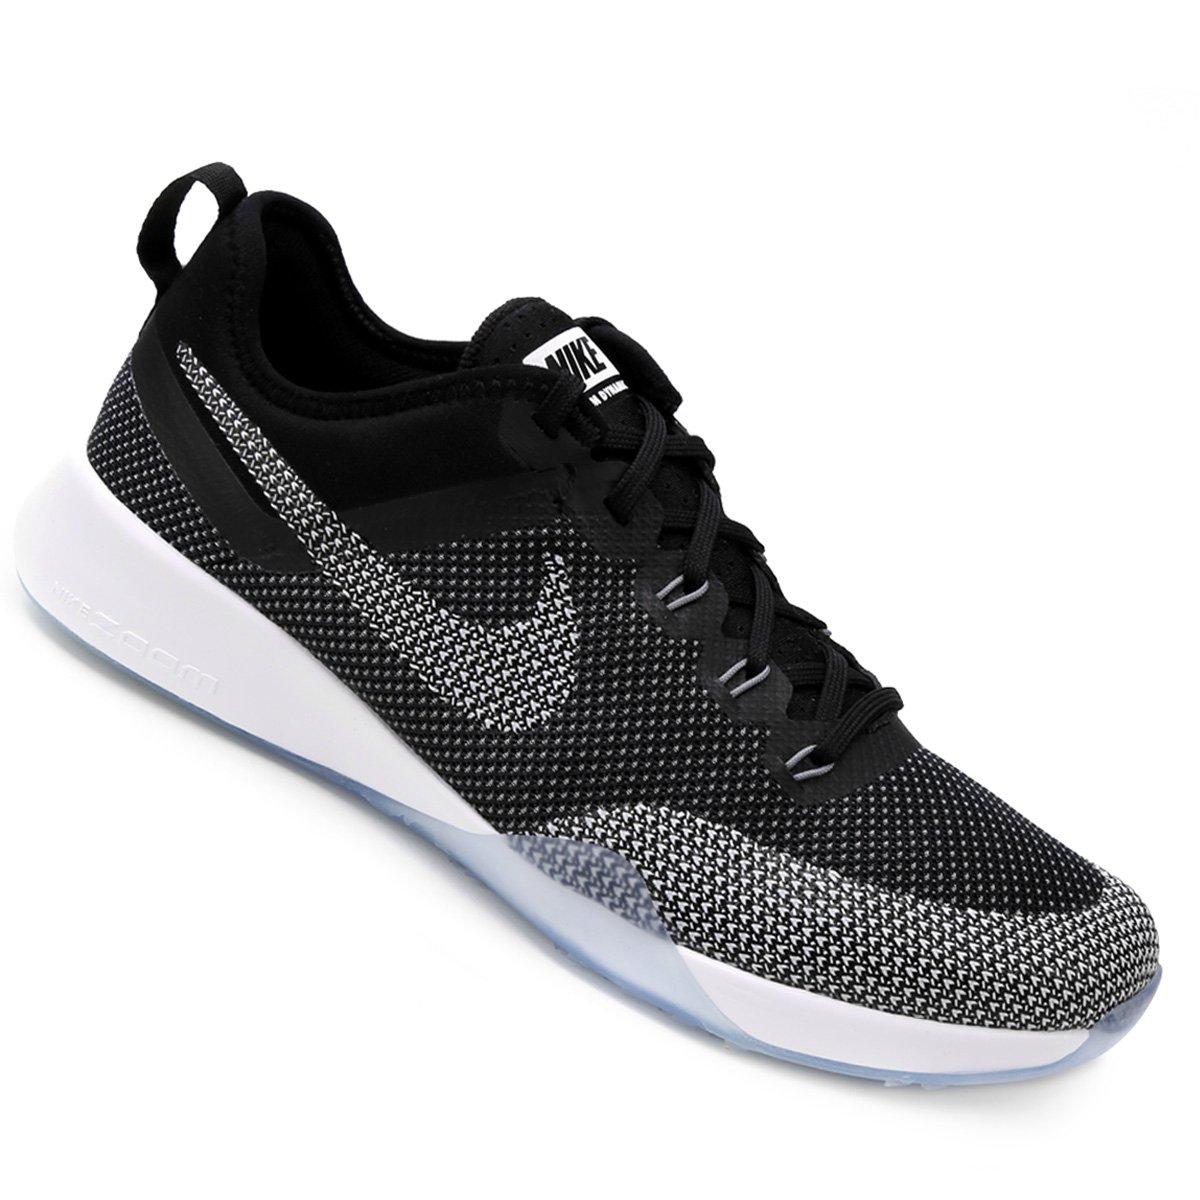 Tênis Nike Air Zoom TR Dynamic Feminino - Compre Agora  f93e150d043a5